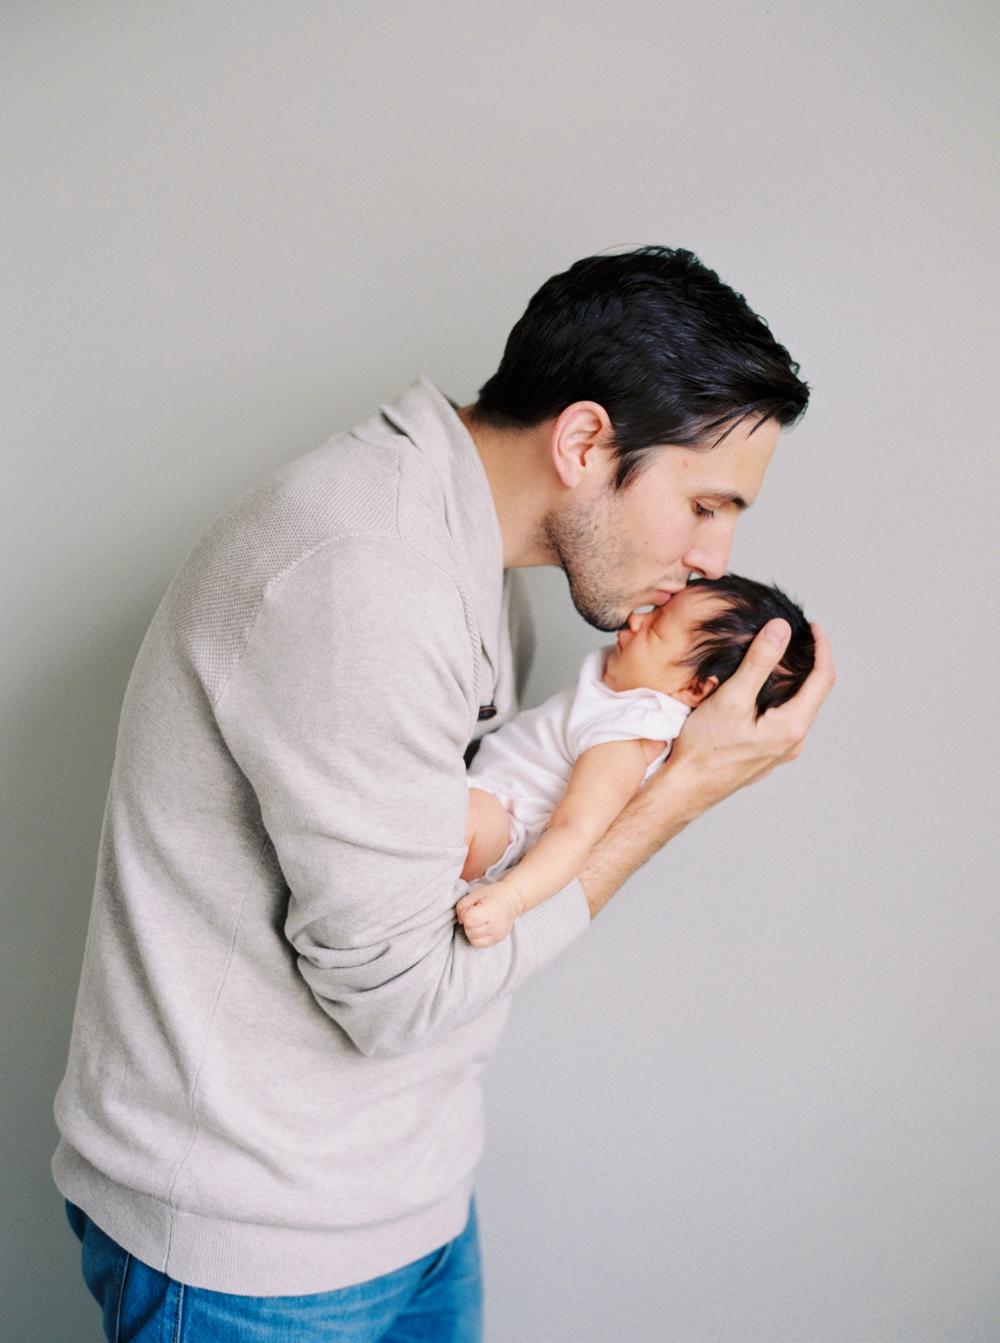 Calgary Wedding Photographers | Calgary Family Newborn Lifestyle Photography | In Home Family Session